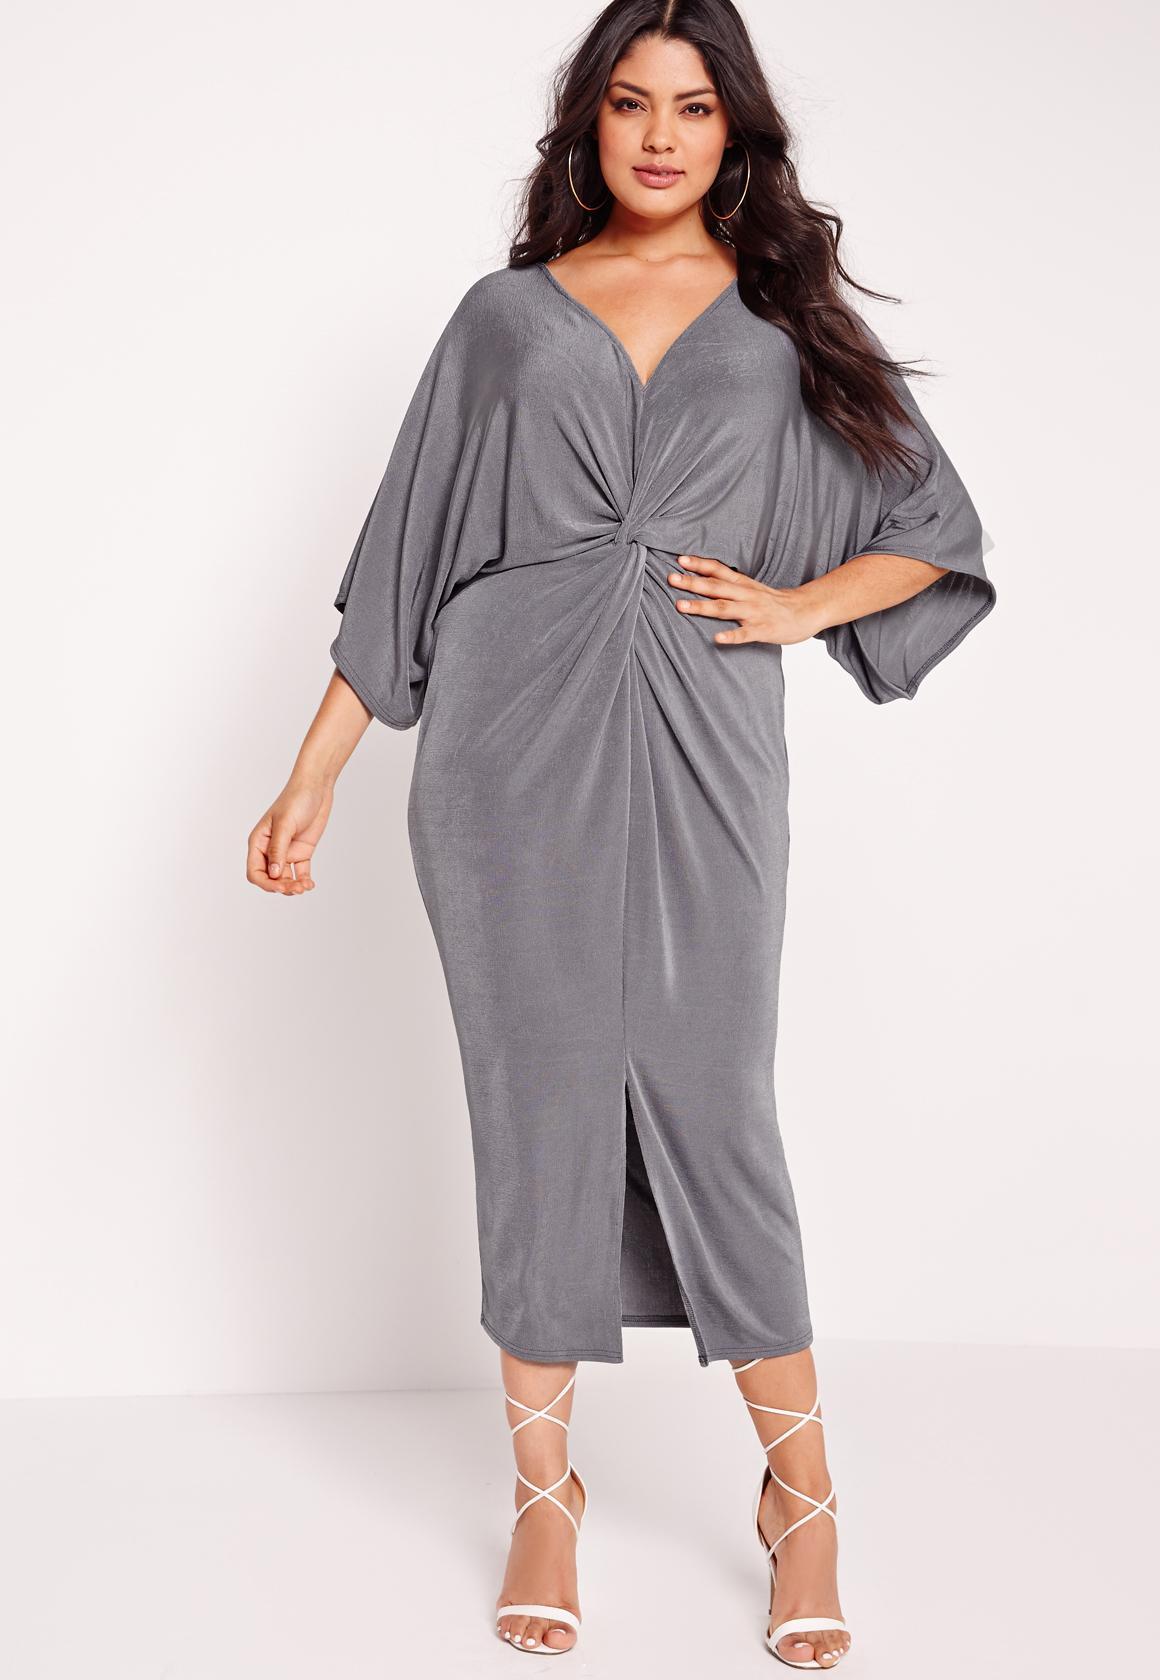 Grey Plus Size Dress - The Best Style Dress In 2018